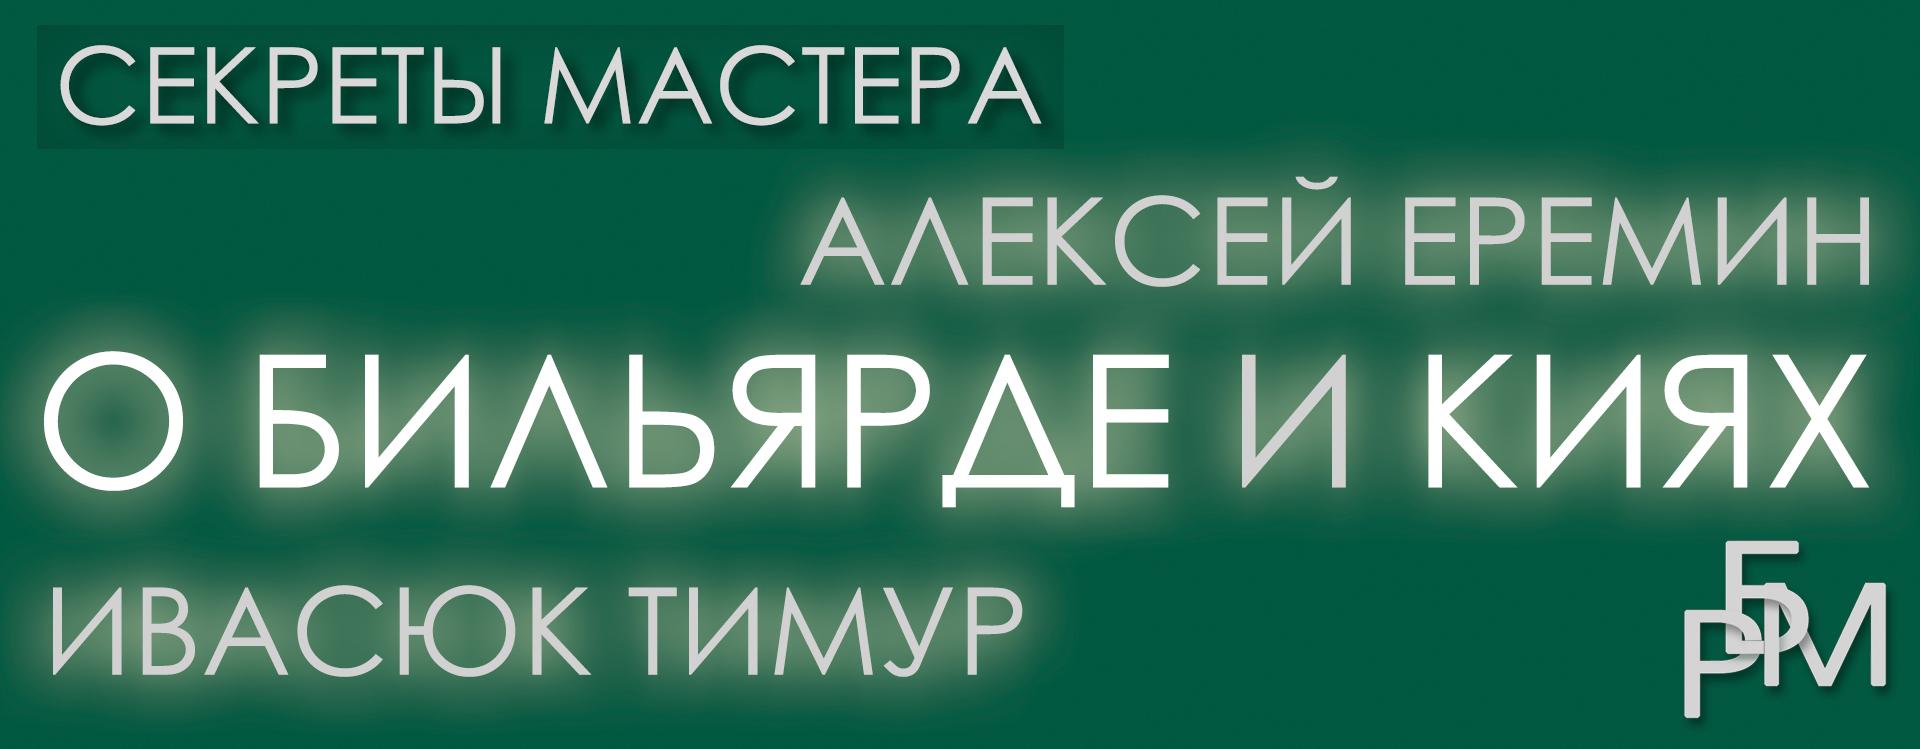 Алексей Ерёмин и Ивасюк Тимур о бильярде и киях